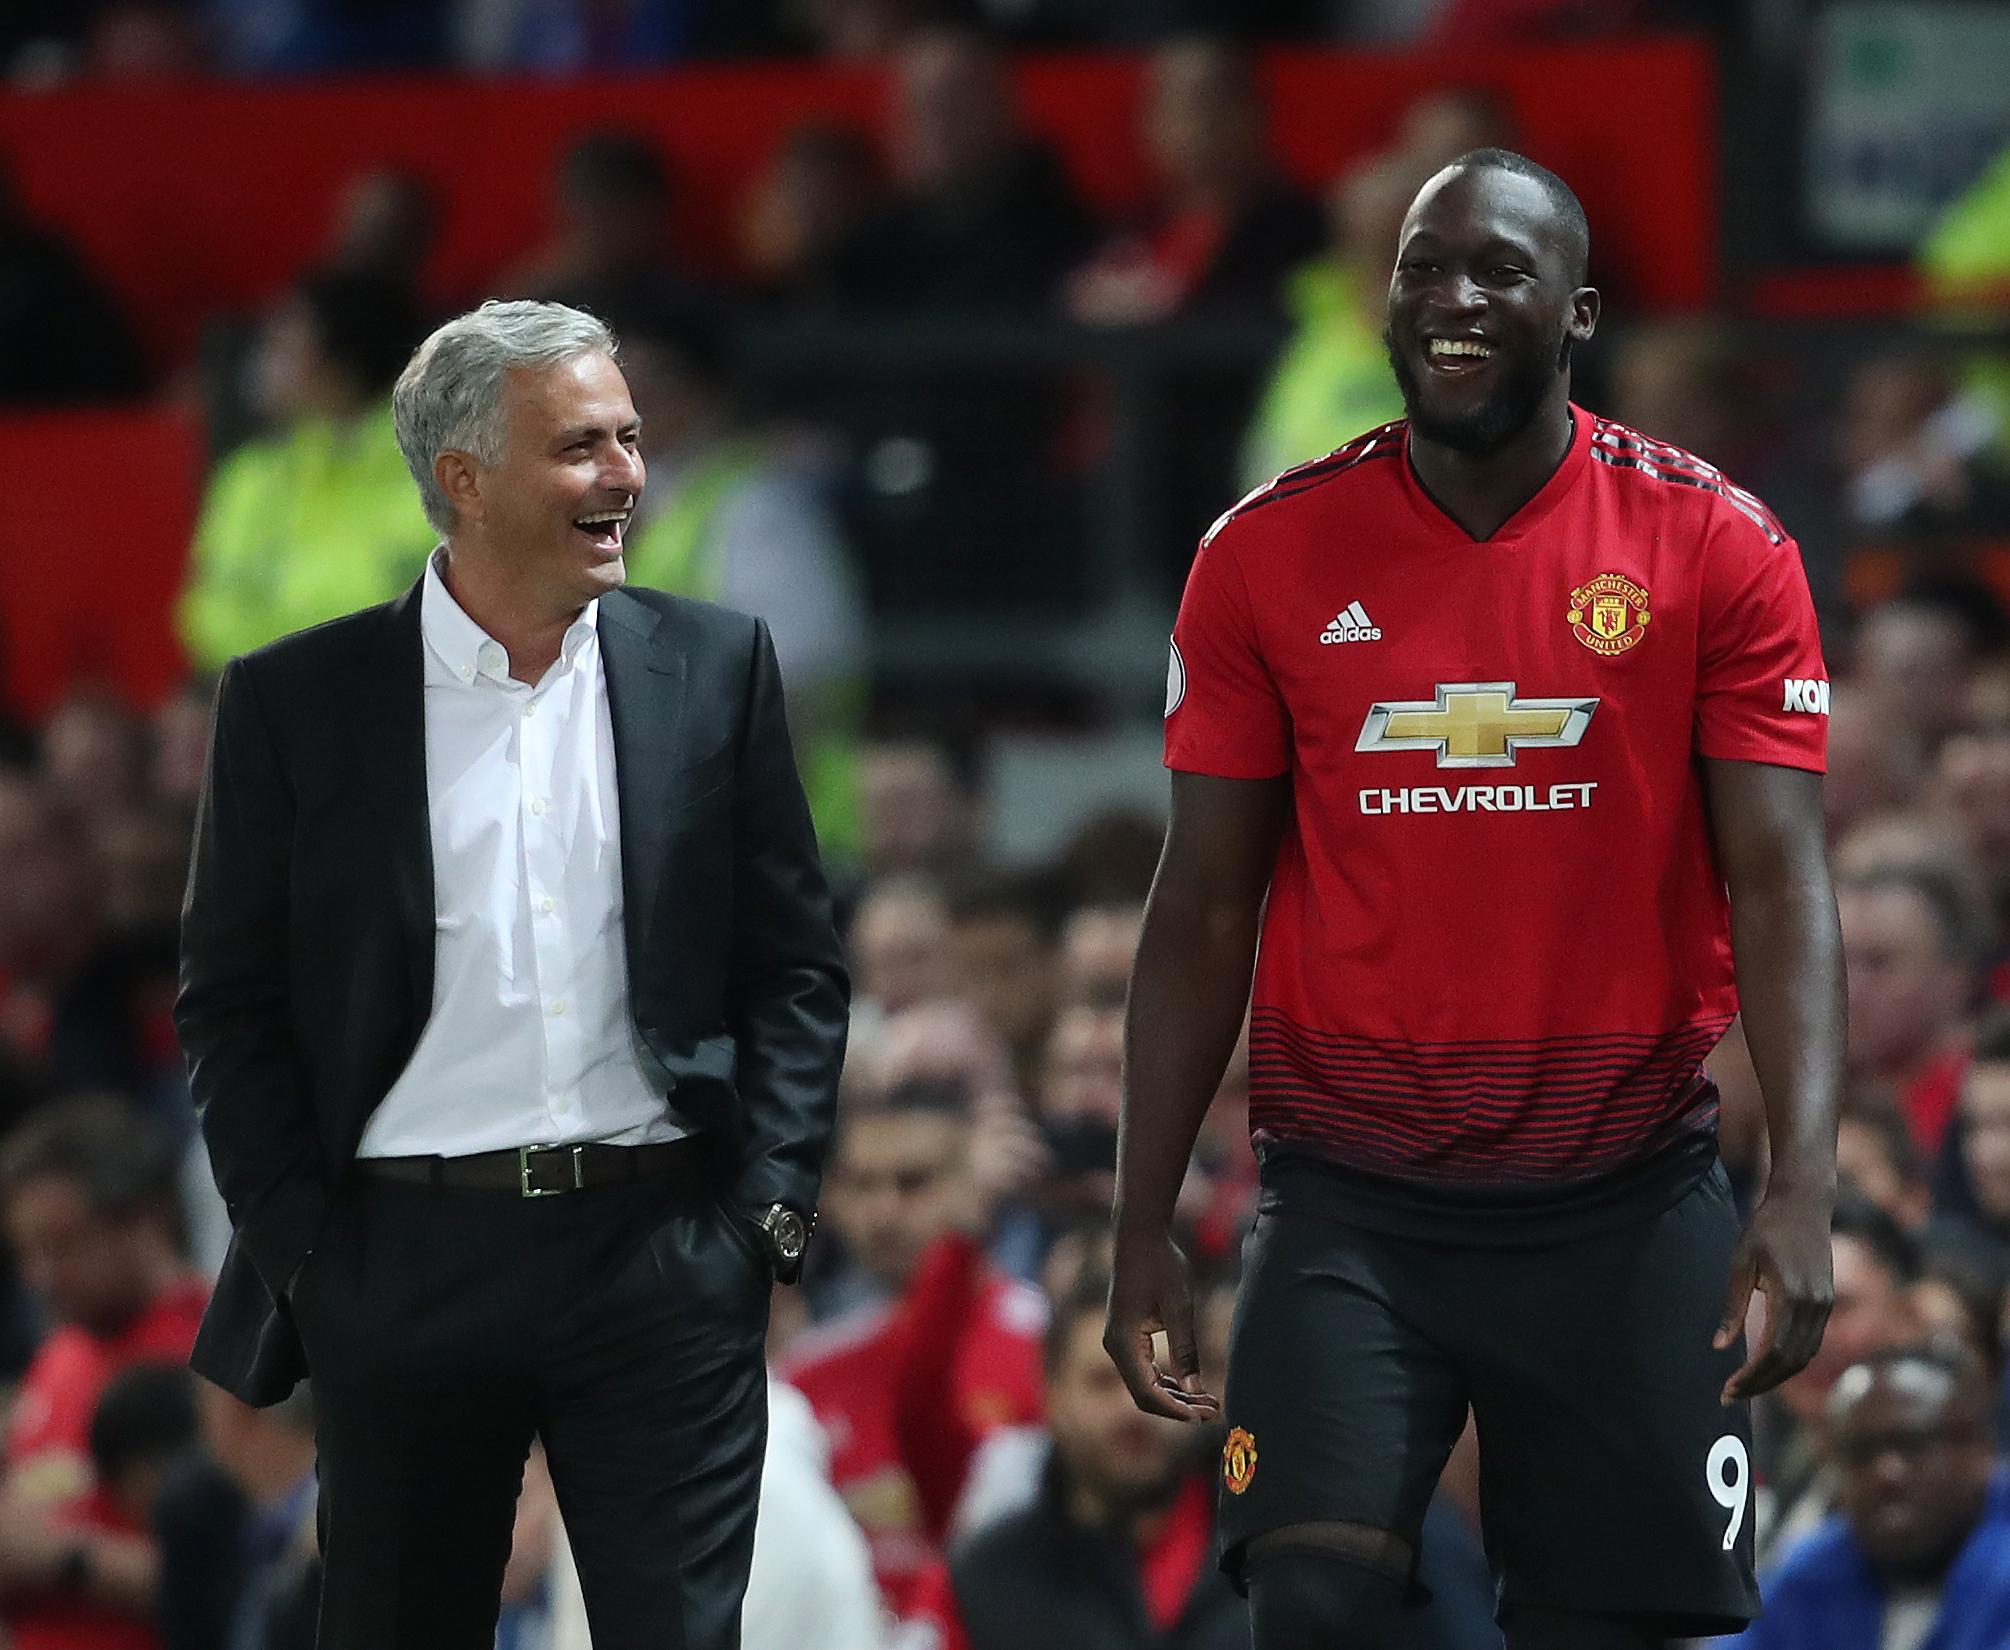 Romelu Lukaku won't have a bad word said about Jose Mourinho